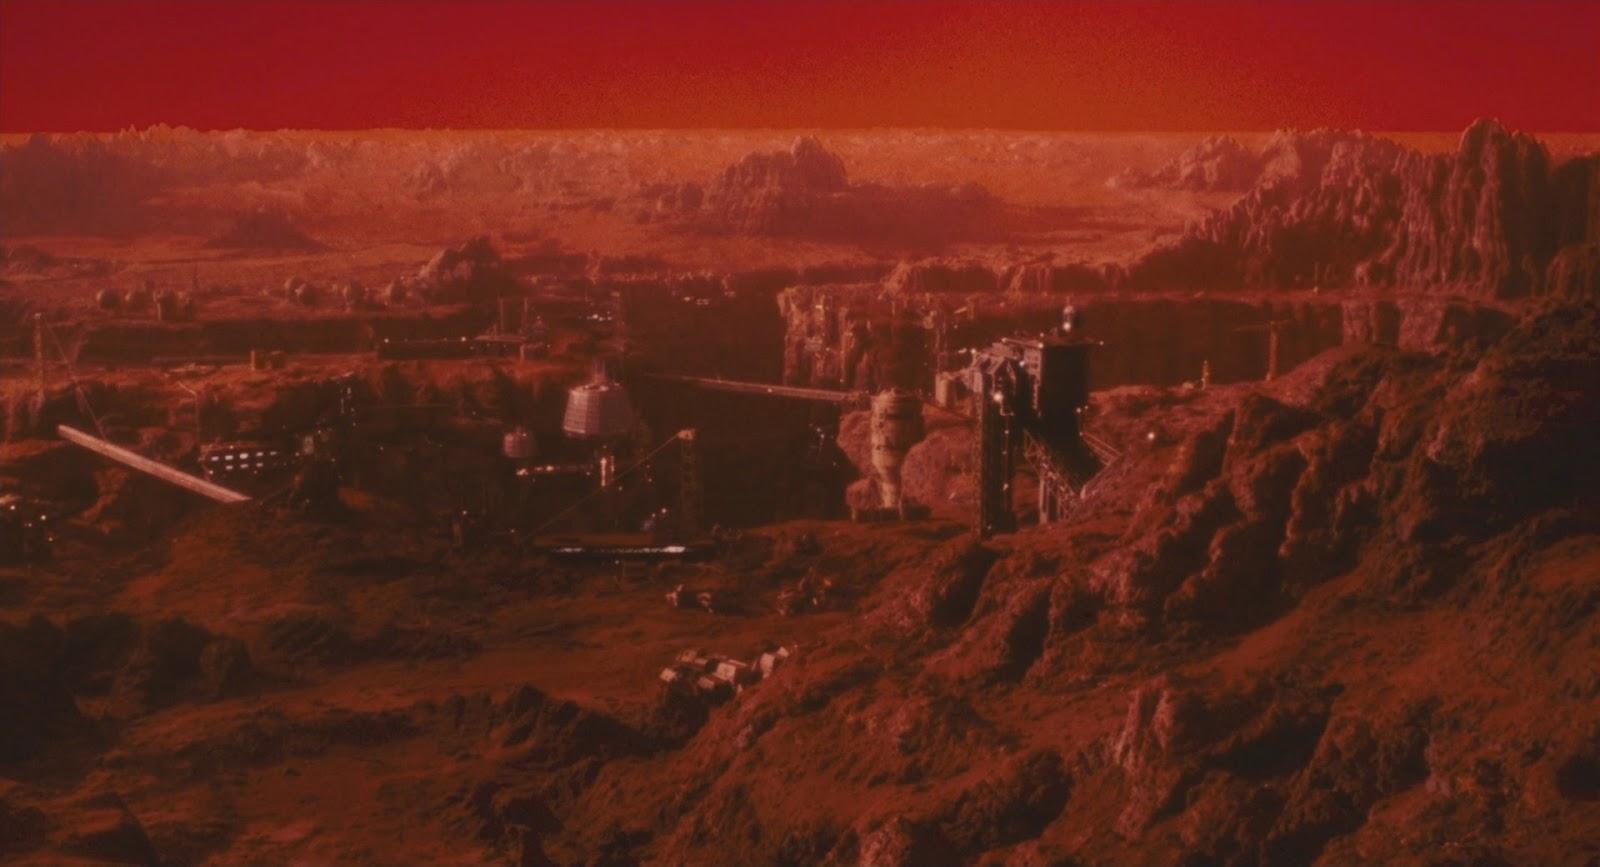 07_mars_colony_total_recall_1990_movie_image.jpg